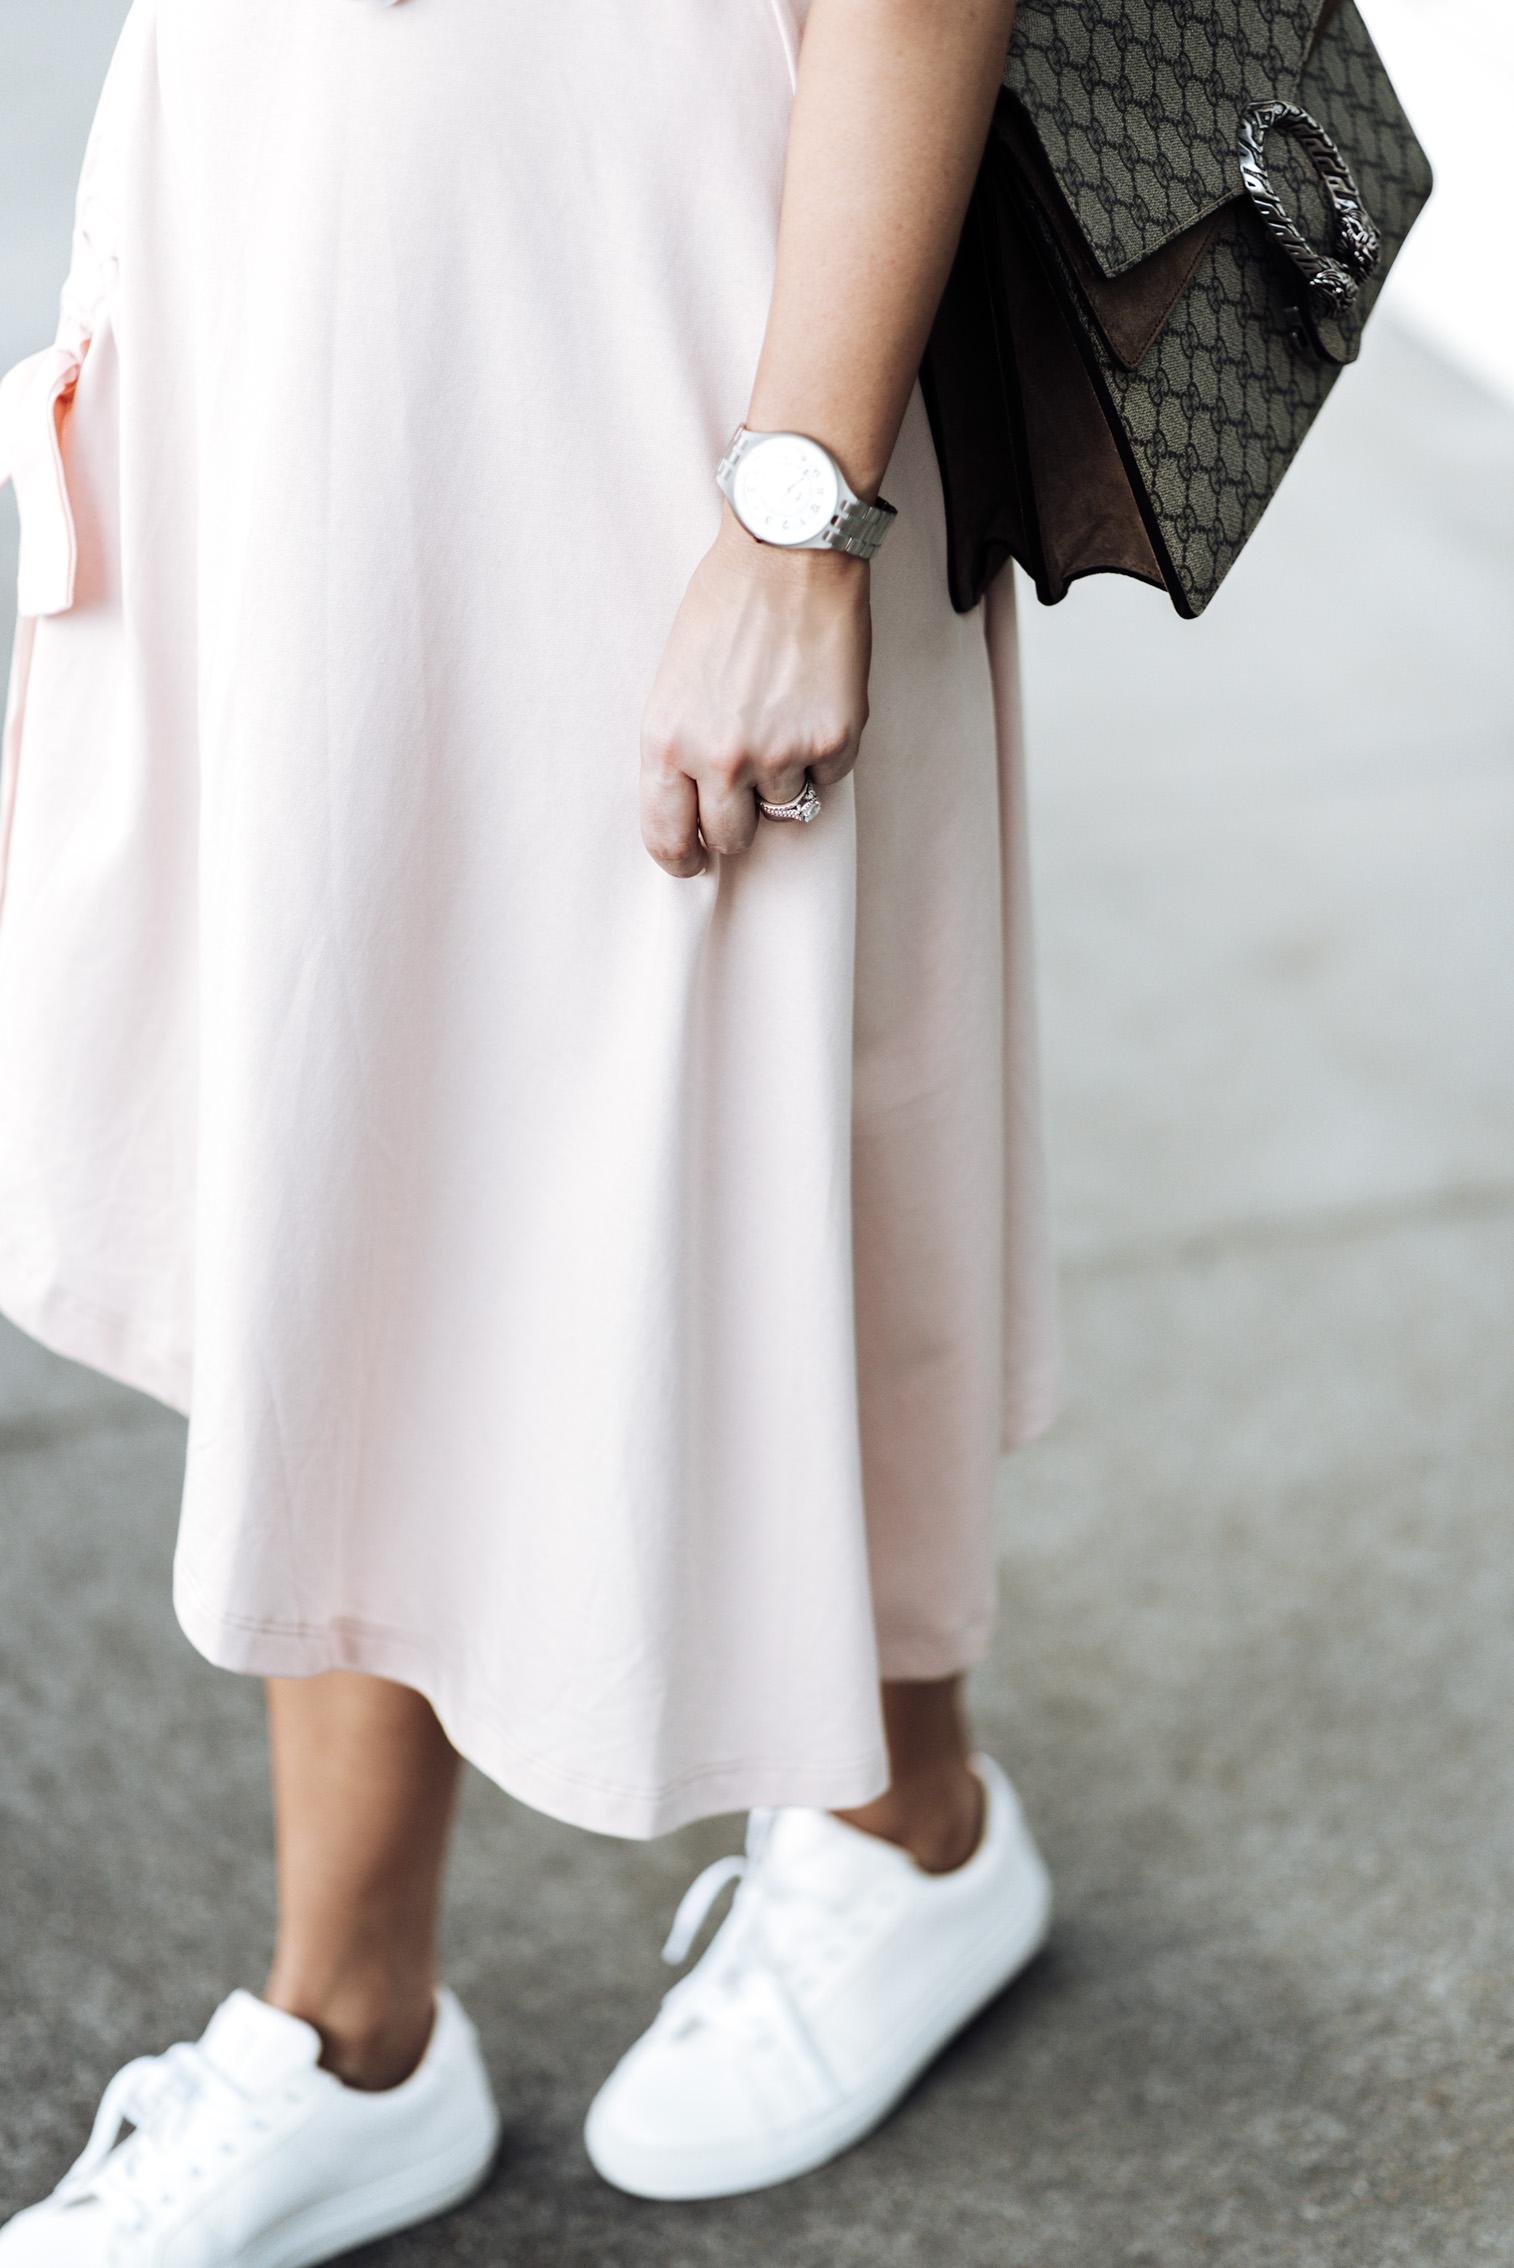 Tiffany Jais Houston fashion and lifestyle blogger | ASOS pink skirt | Cotton crew neck tee | {C/O} Greats sneakers | Gucci Dionysus Bag | Brixton Willow hat | {C/O} Mini Marie Pendant |